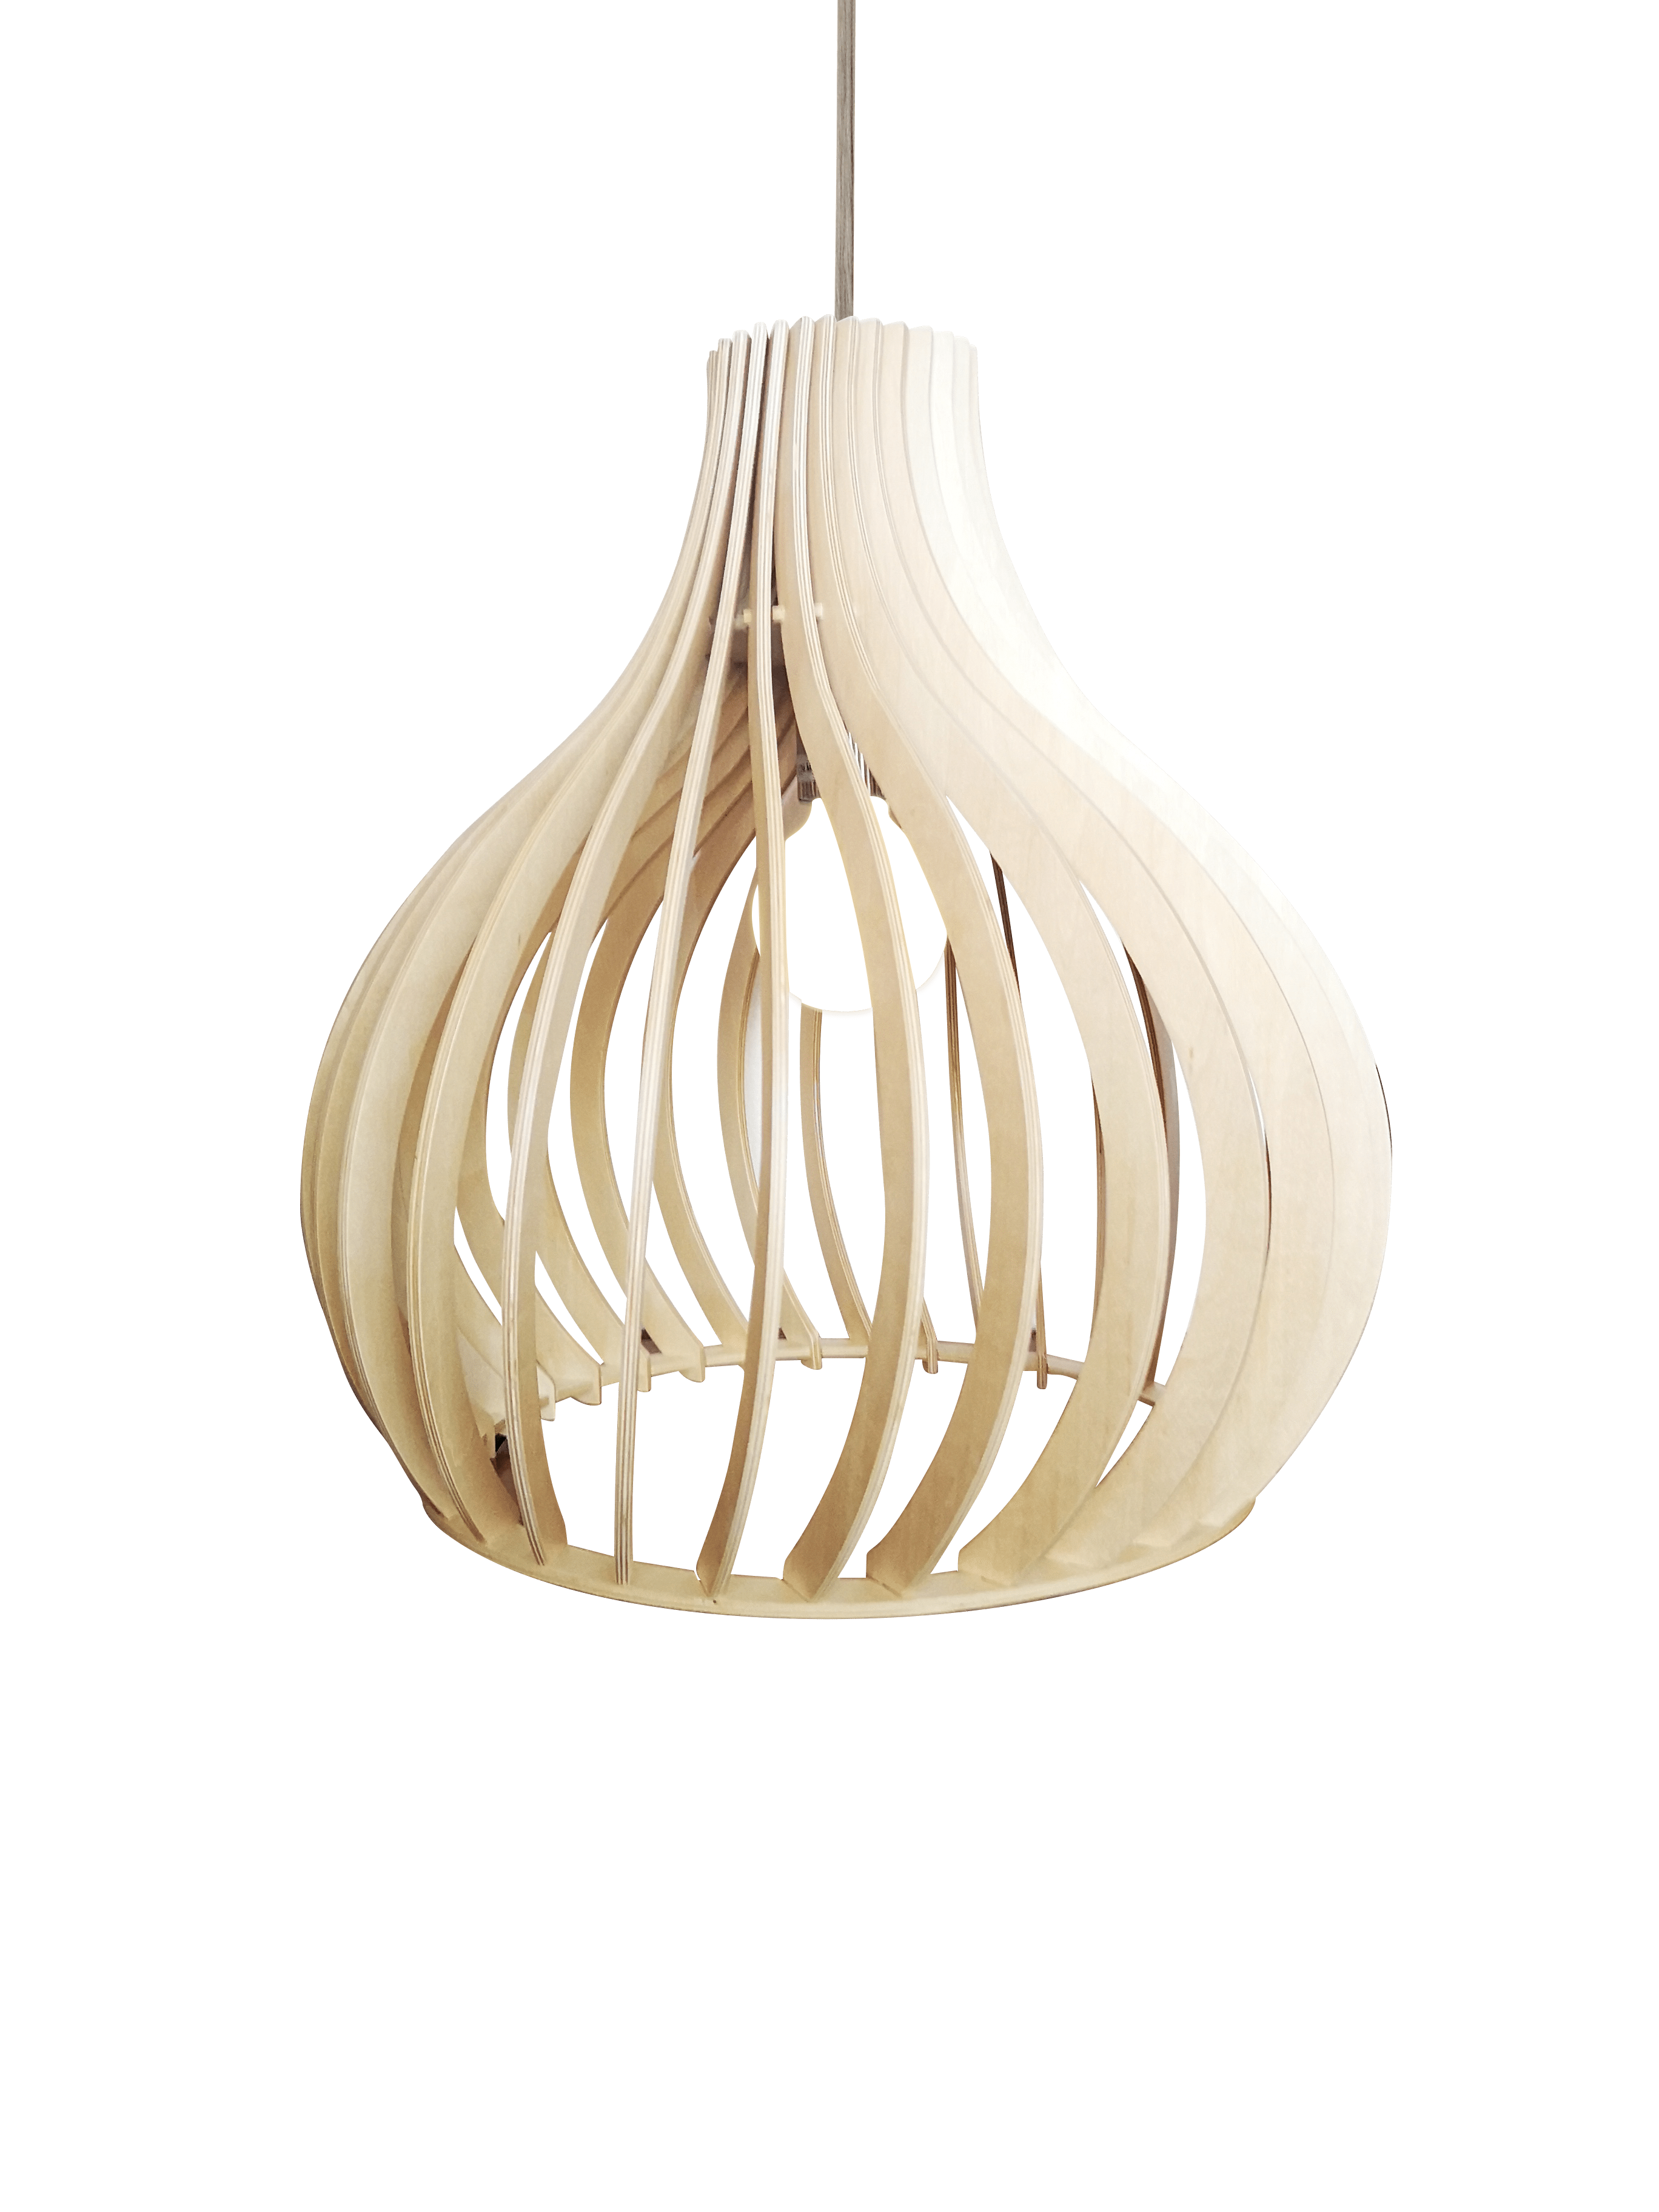 Archini Twist hanglamp - 45 cm - hout natuur